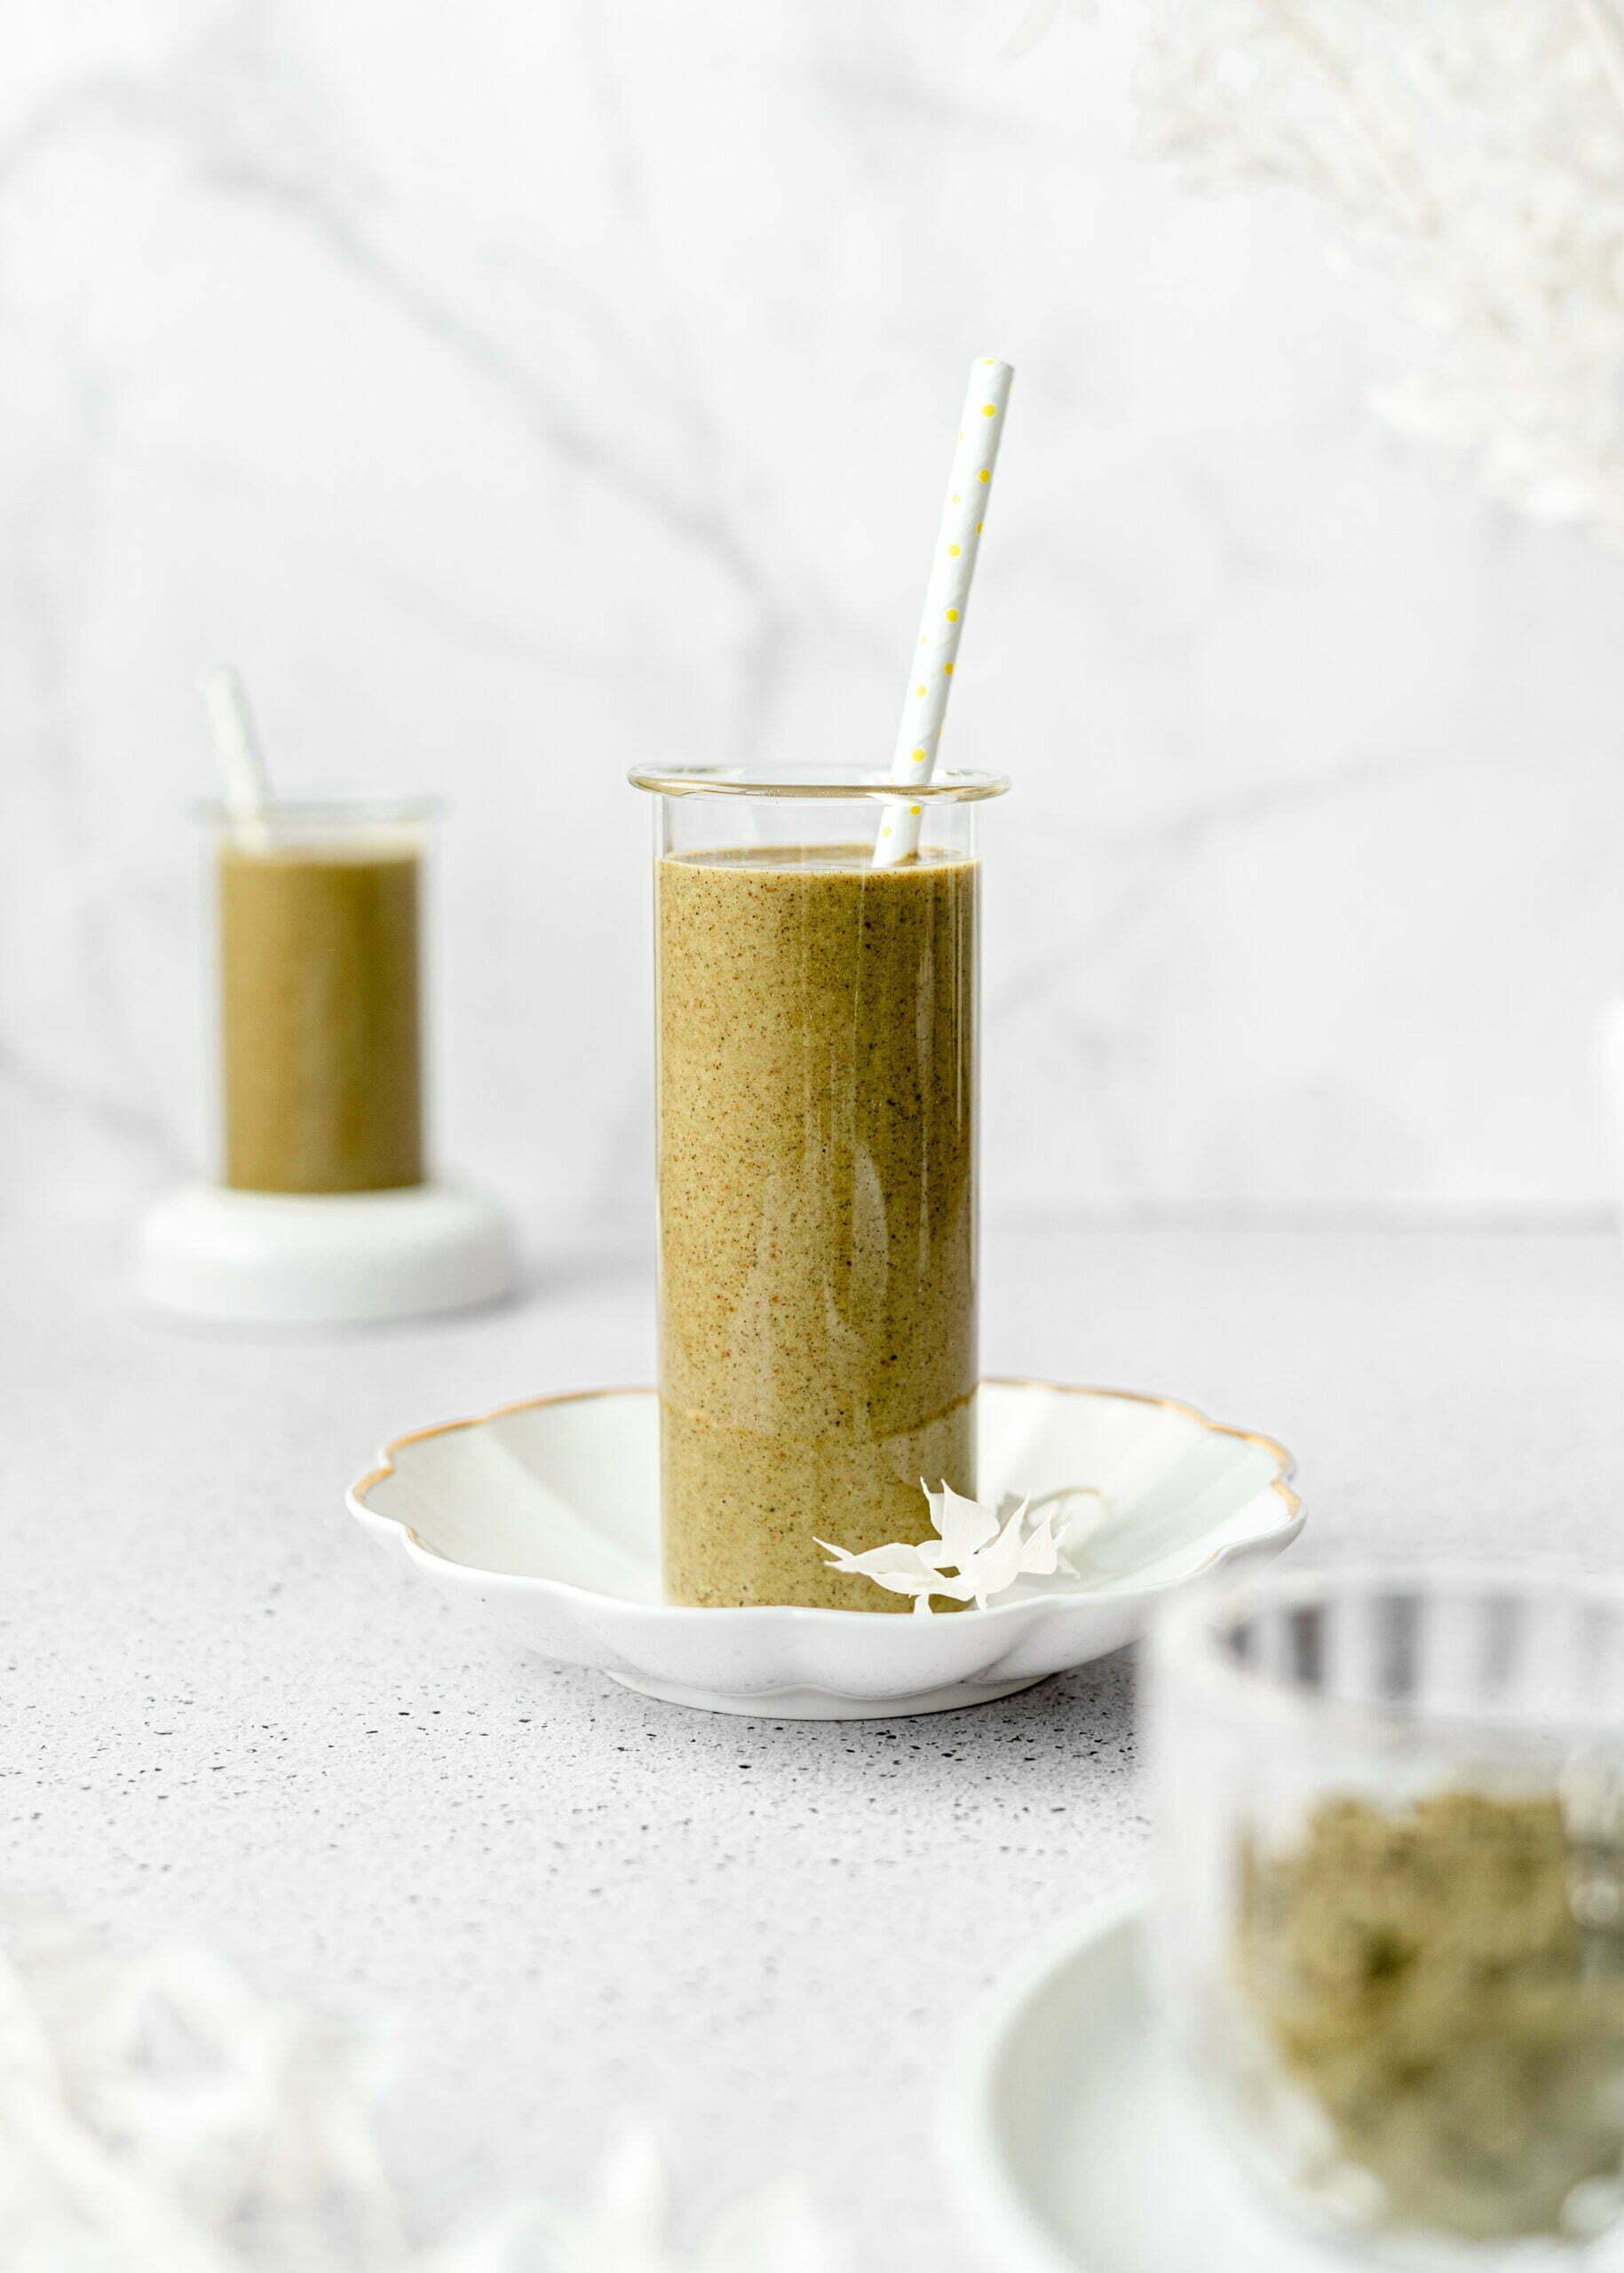 Konopljin proteinski smoothie